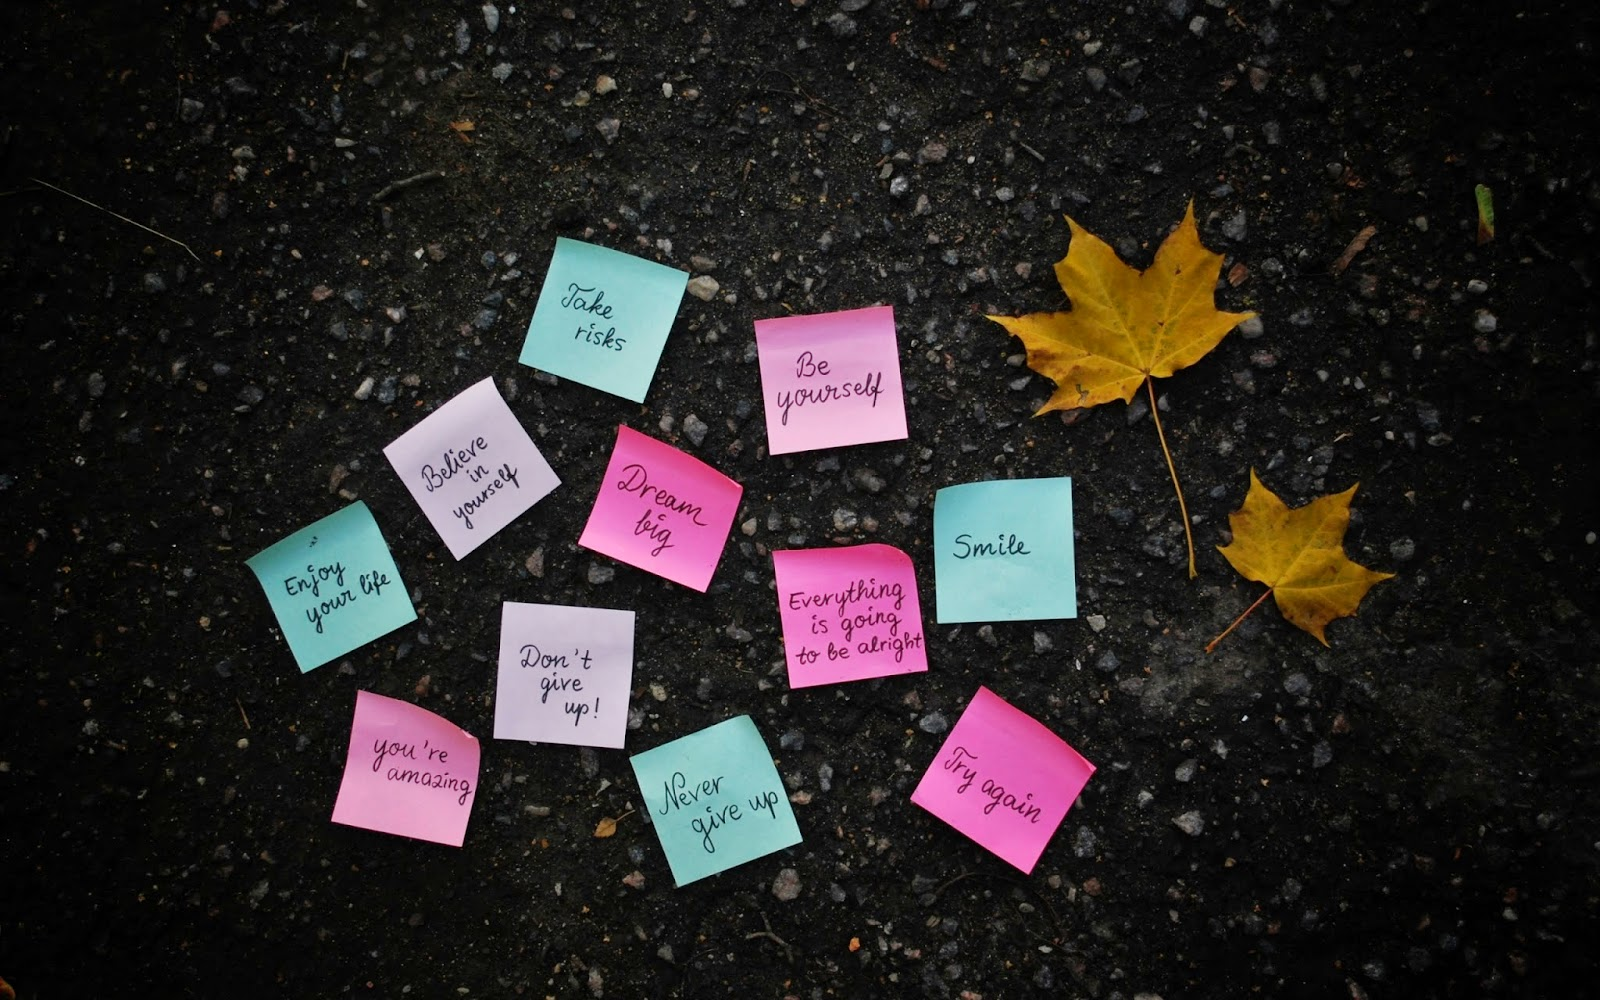 30 Best Life Quote Hd Wallpapers Hd Wallpaper Jos